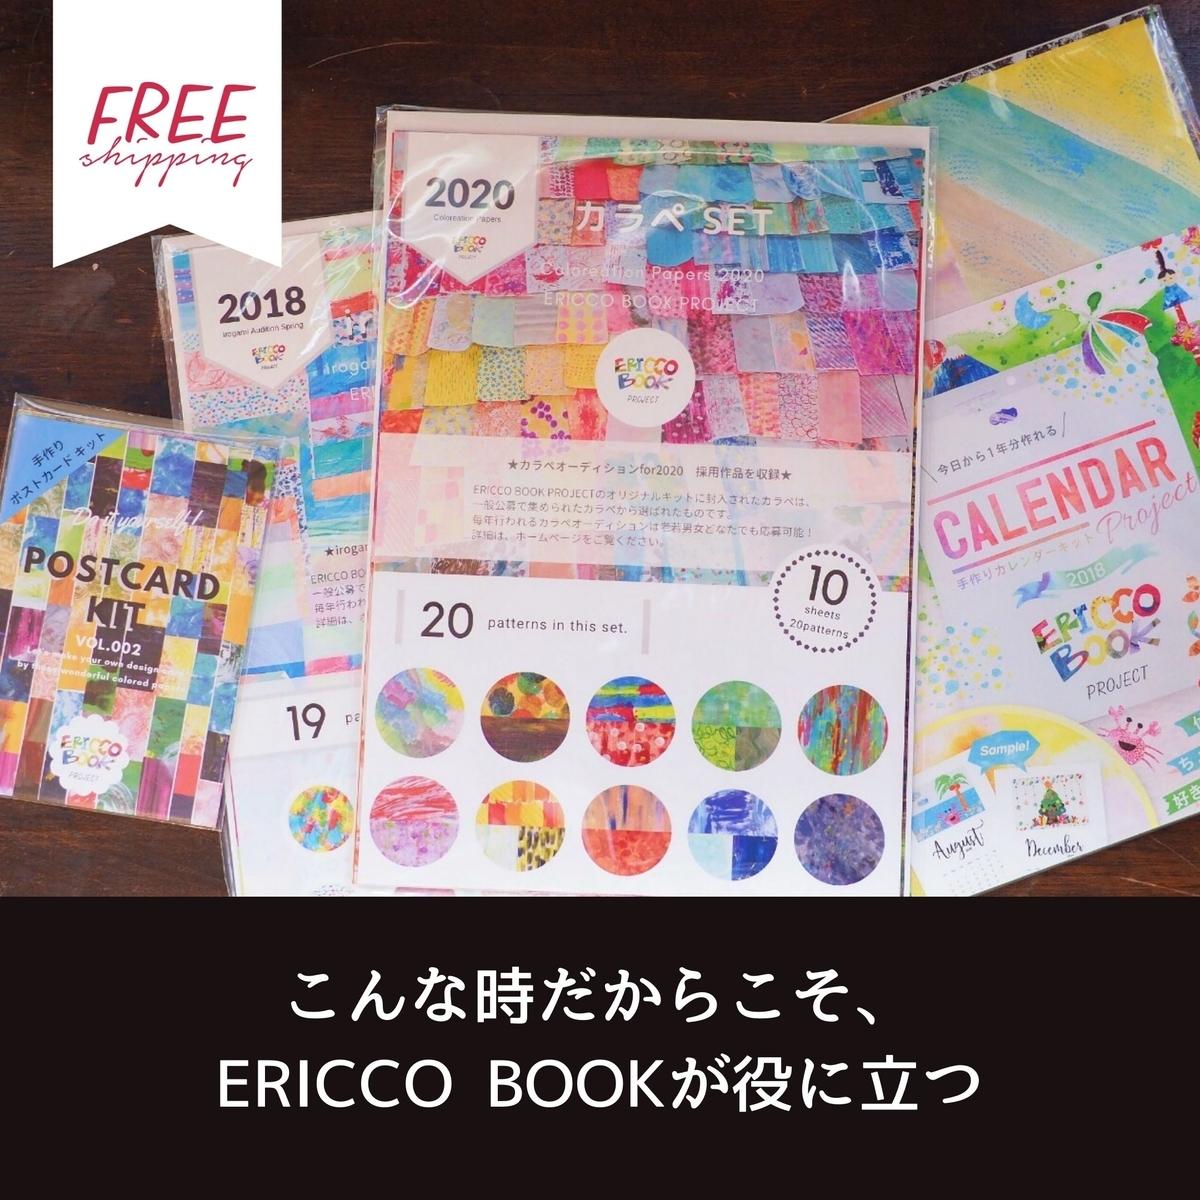 f:id:ericcobook:20200228175105j:plain